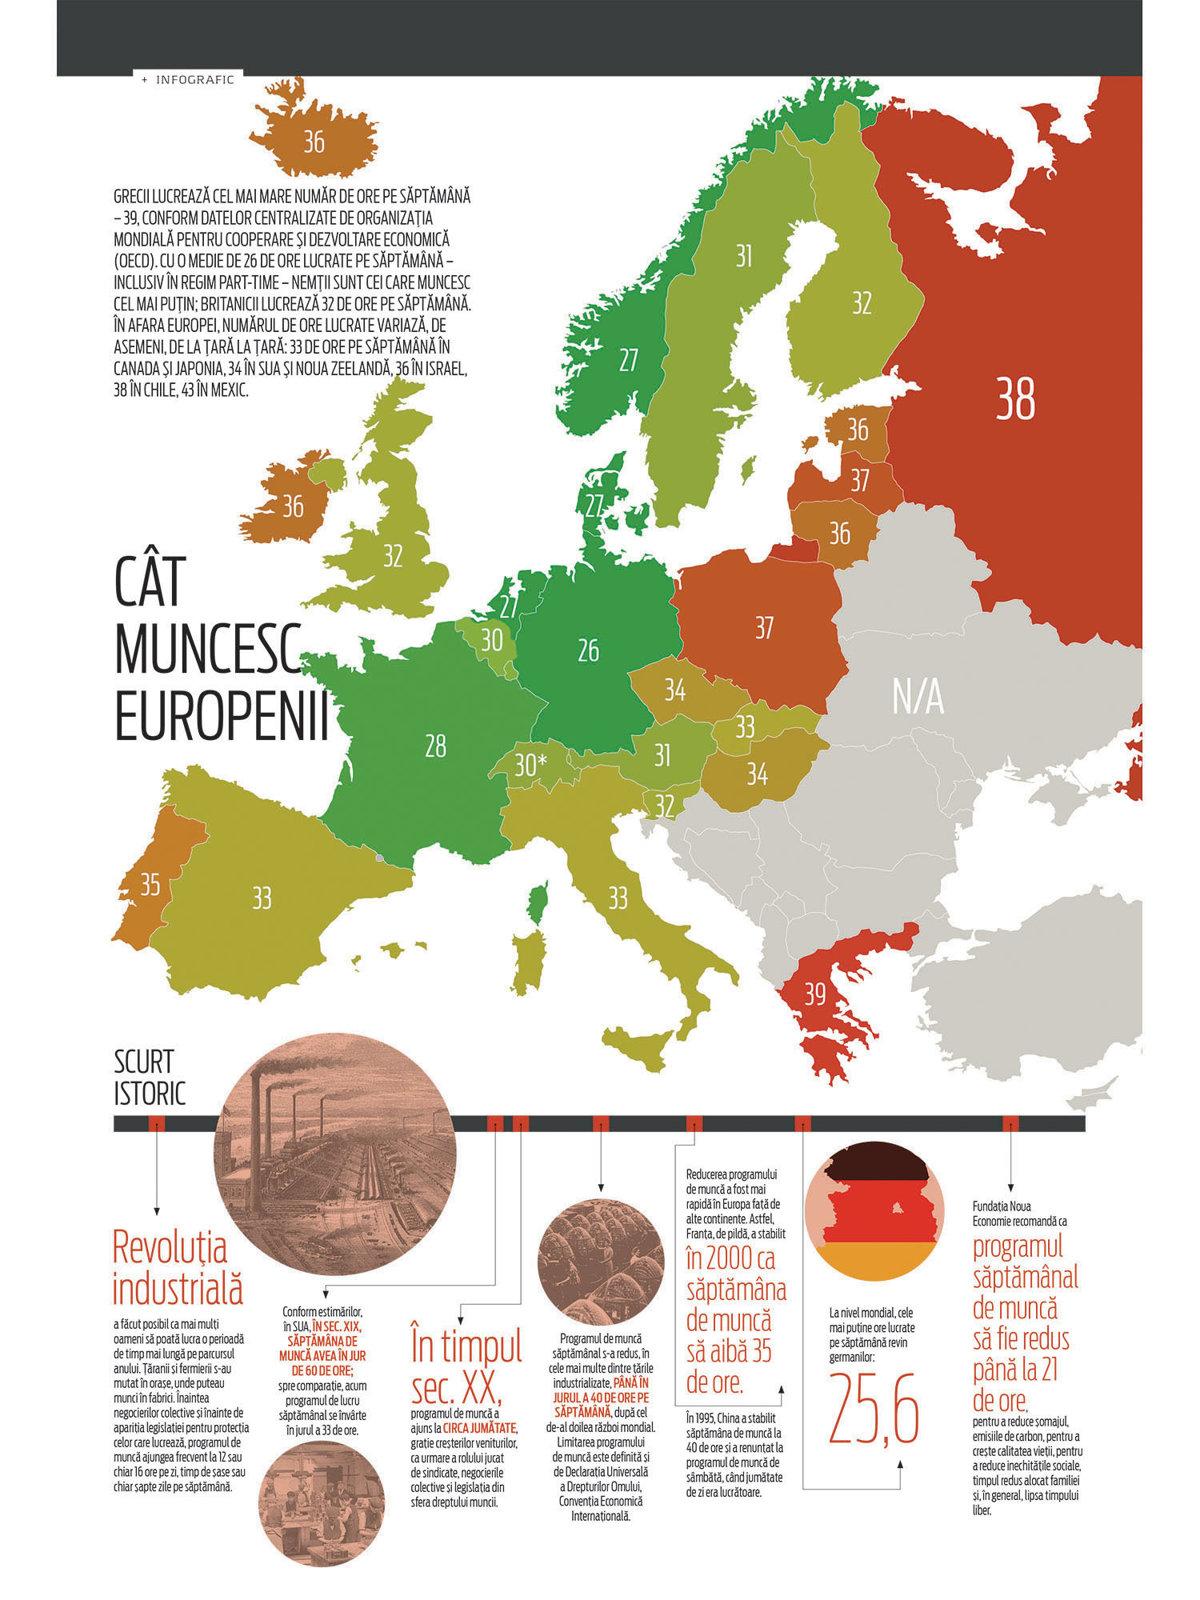 Cât muncesc europenii